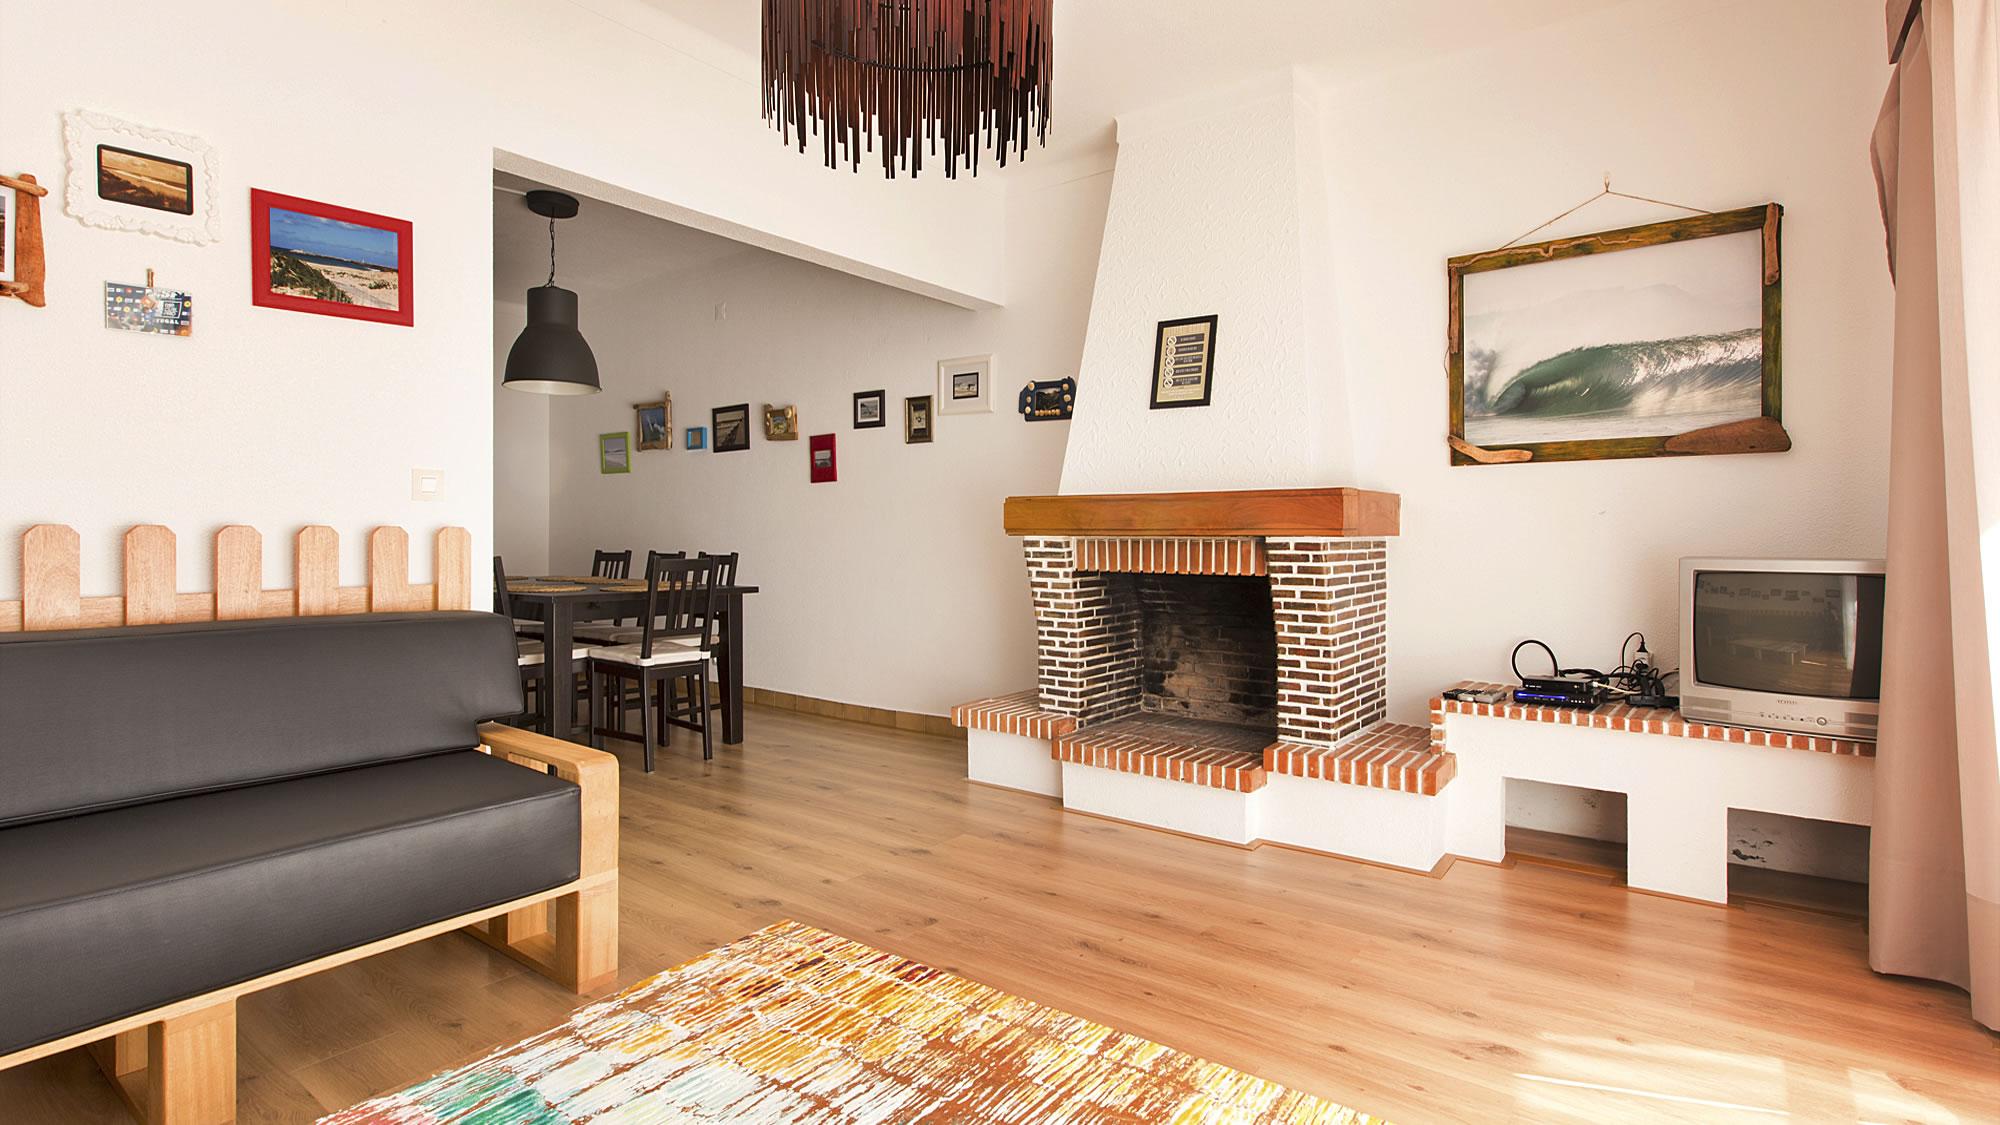 Super Tubos Living Room C Baleal Surf Camp Baleal Surf Camp  # Muebles Con Tuvos